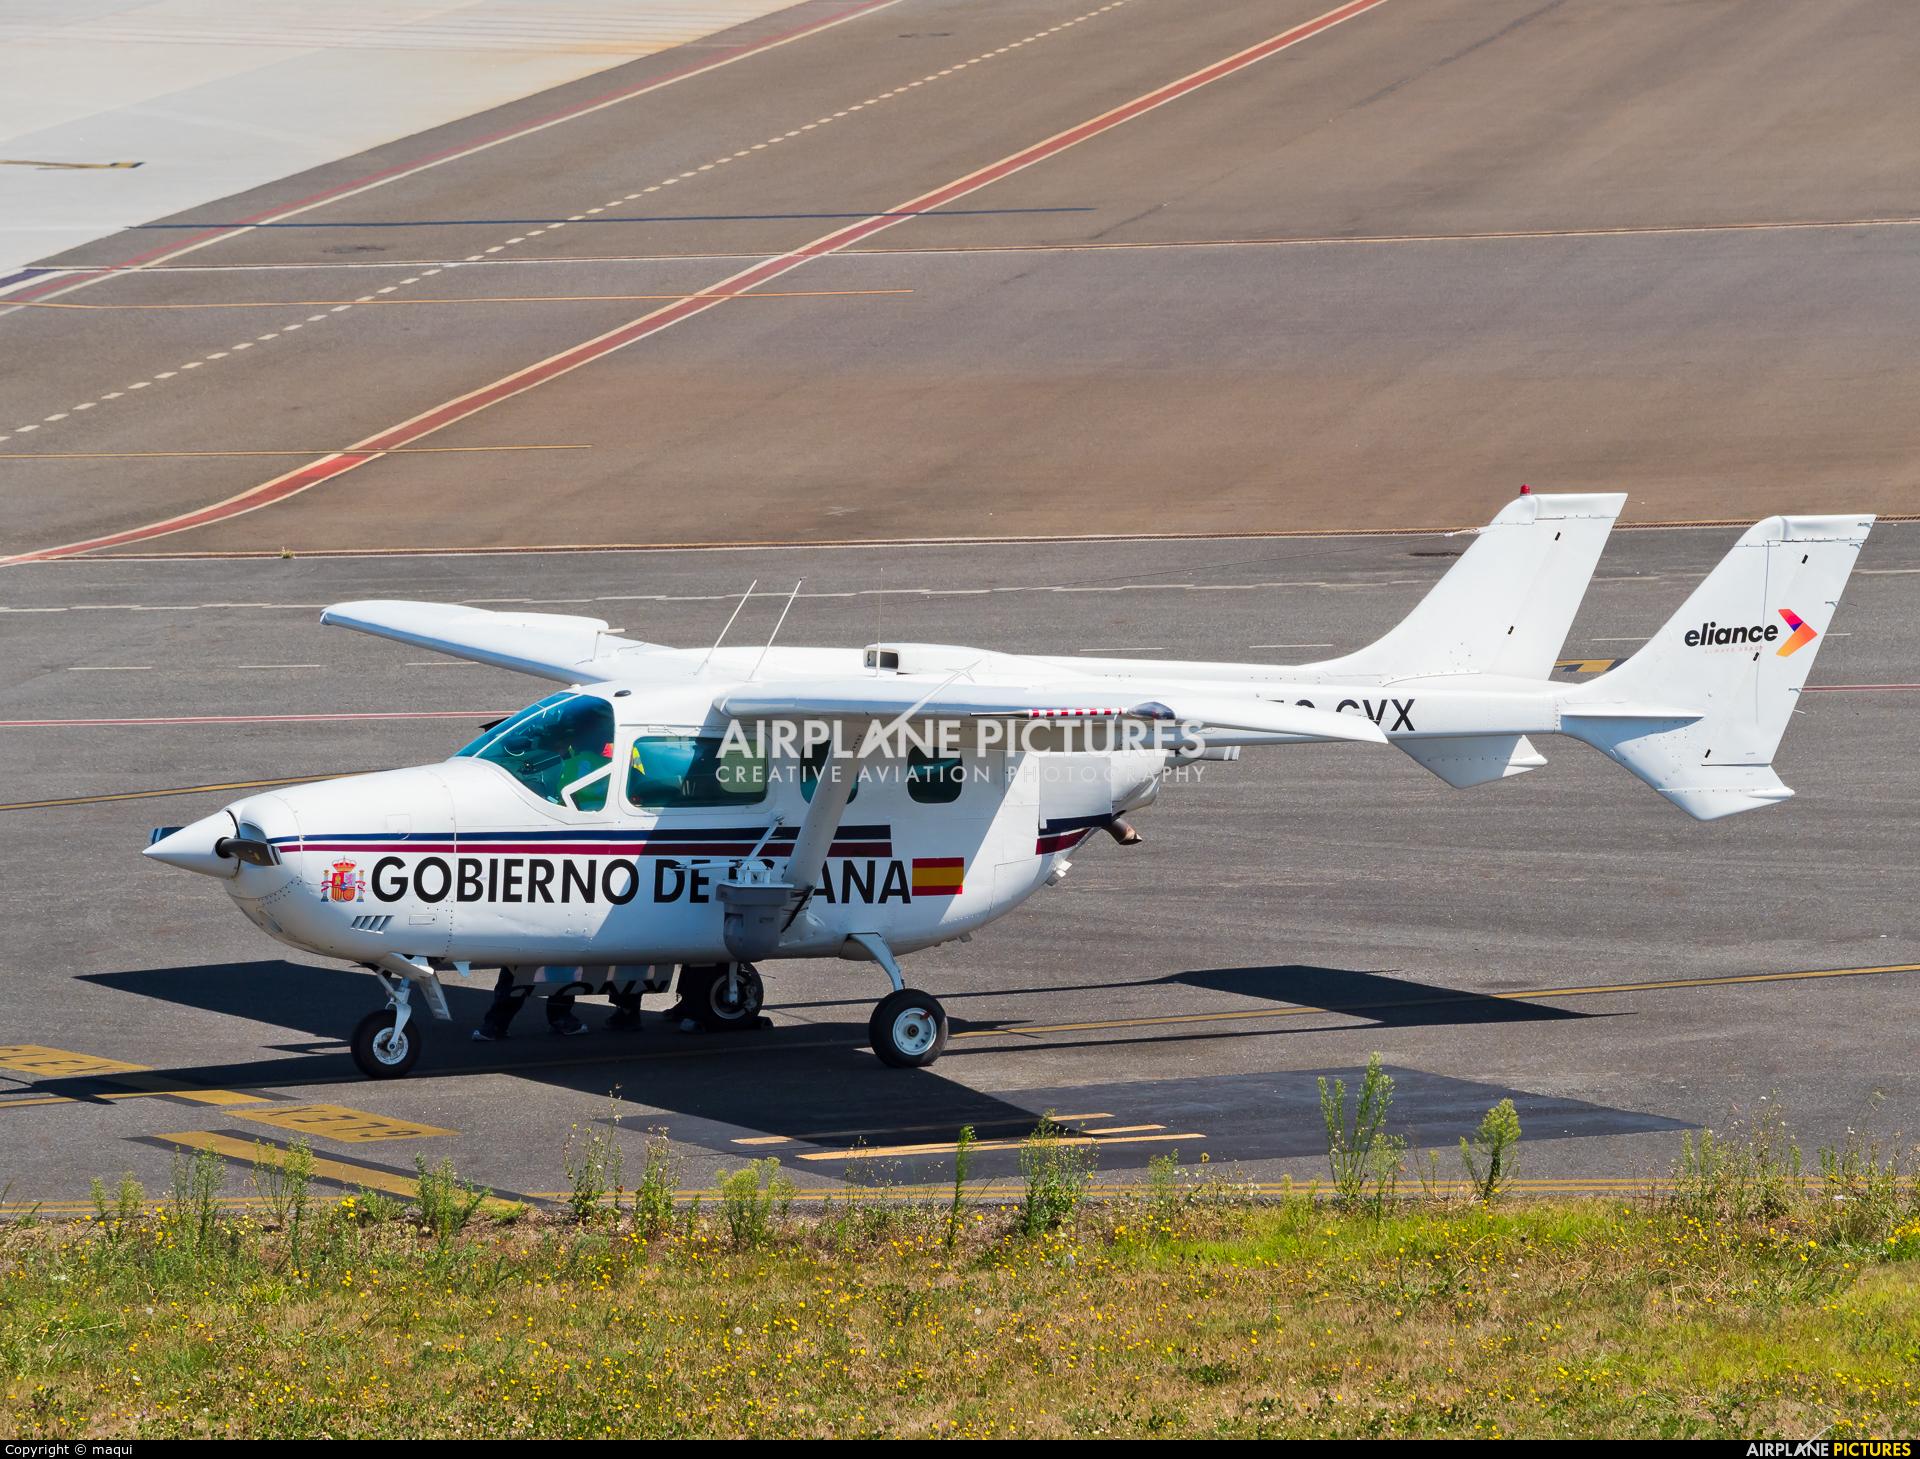 Eliance EC-GVX aircraft at Santiago de Compostela